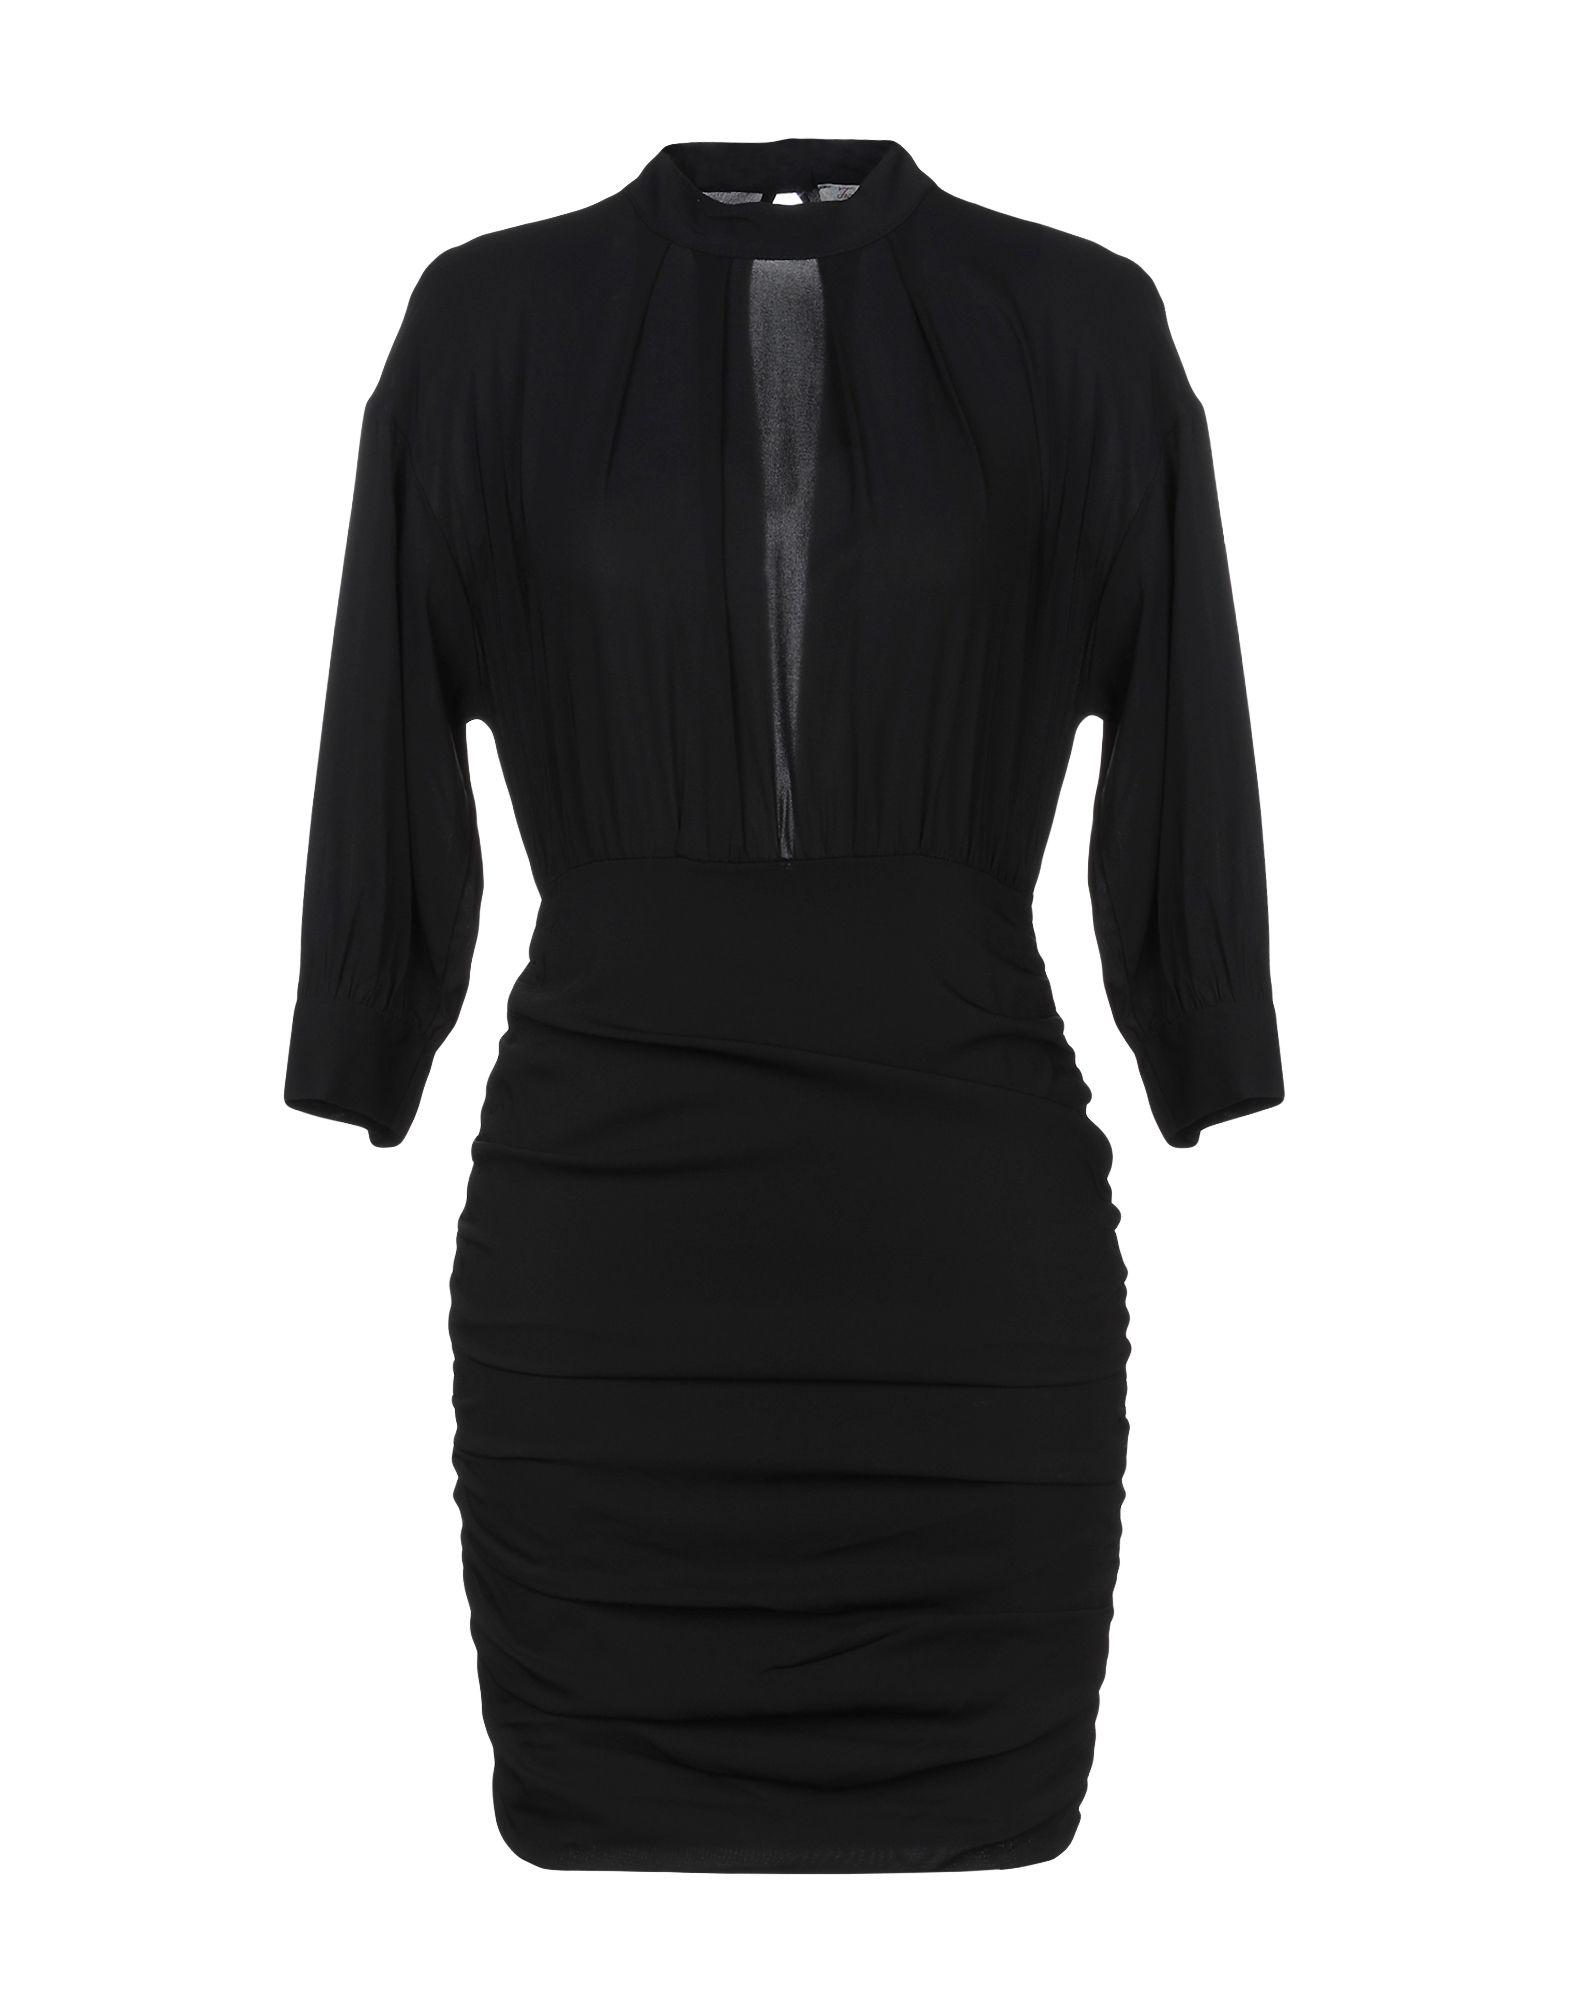 все цены на TWENTY EASY by KAOS Короткое платье онлайн